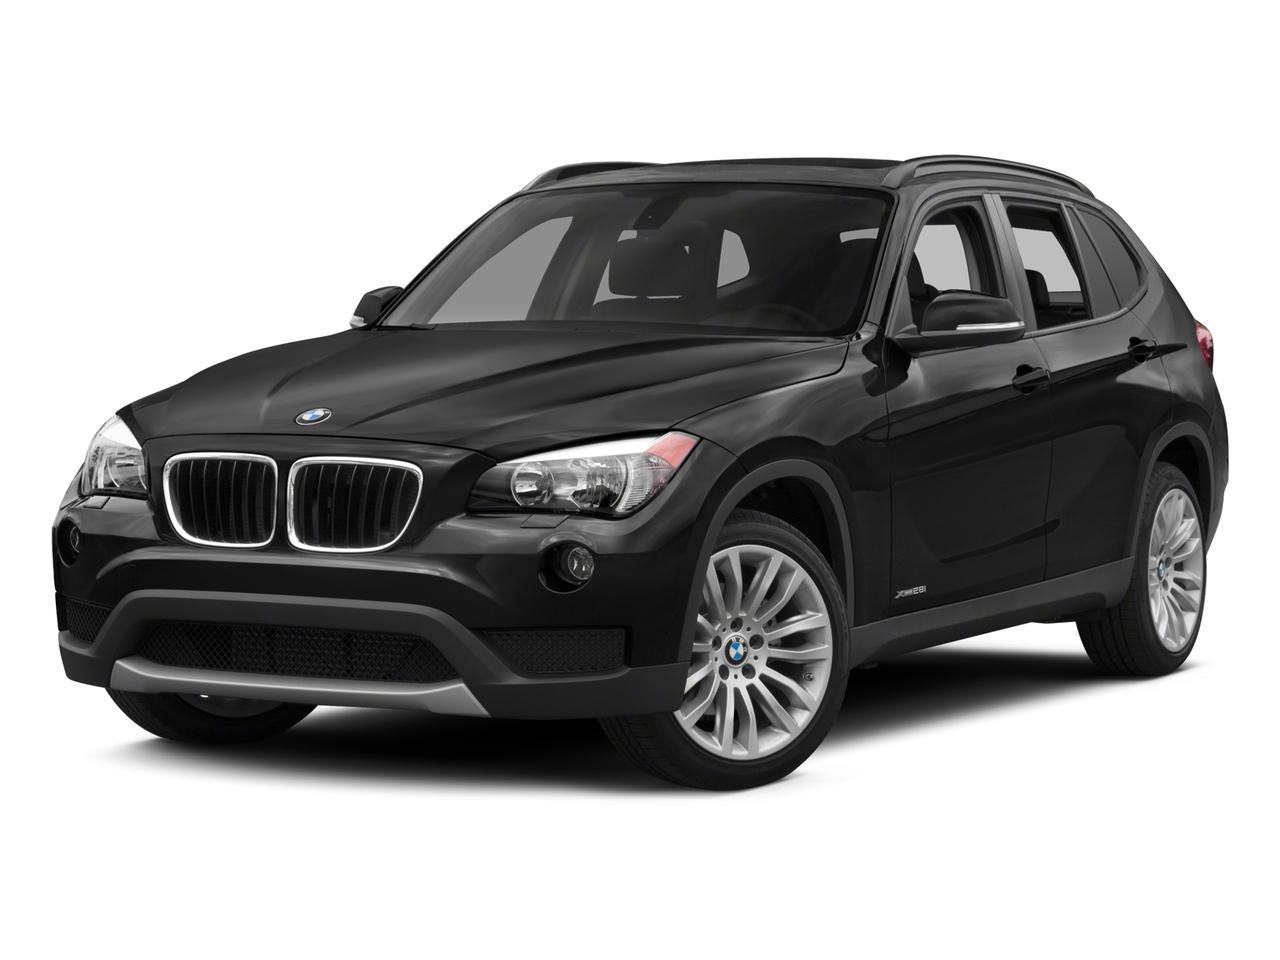 2015 BMW X1 xDrive28i Vehicle Photo in Houston, TX 77054